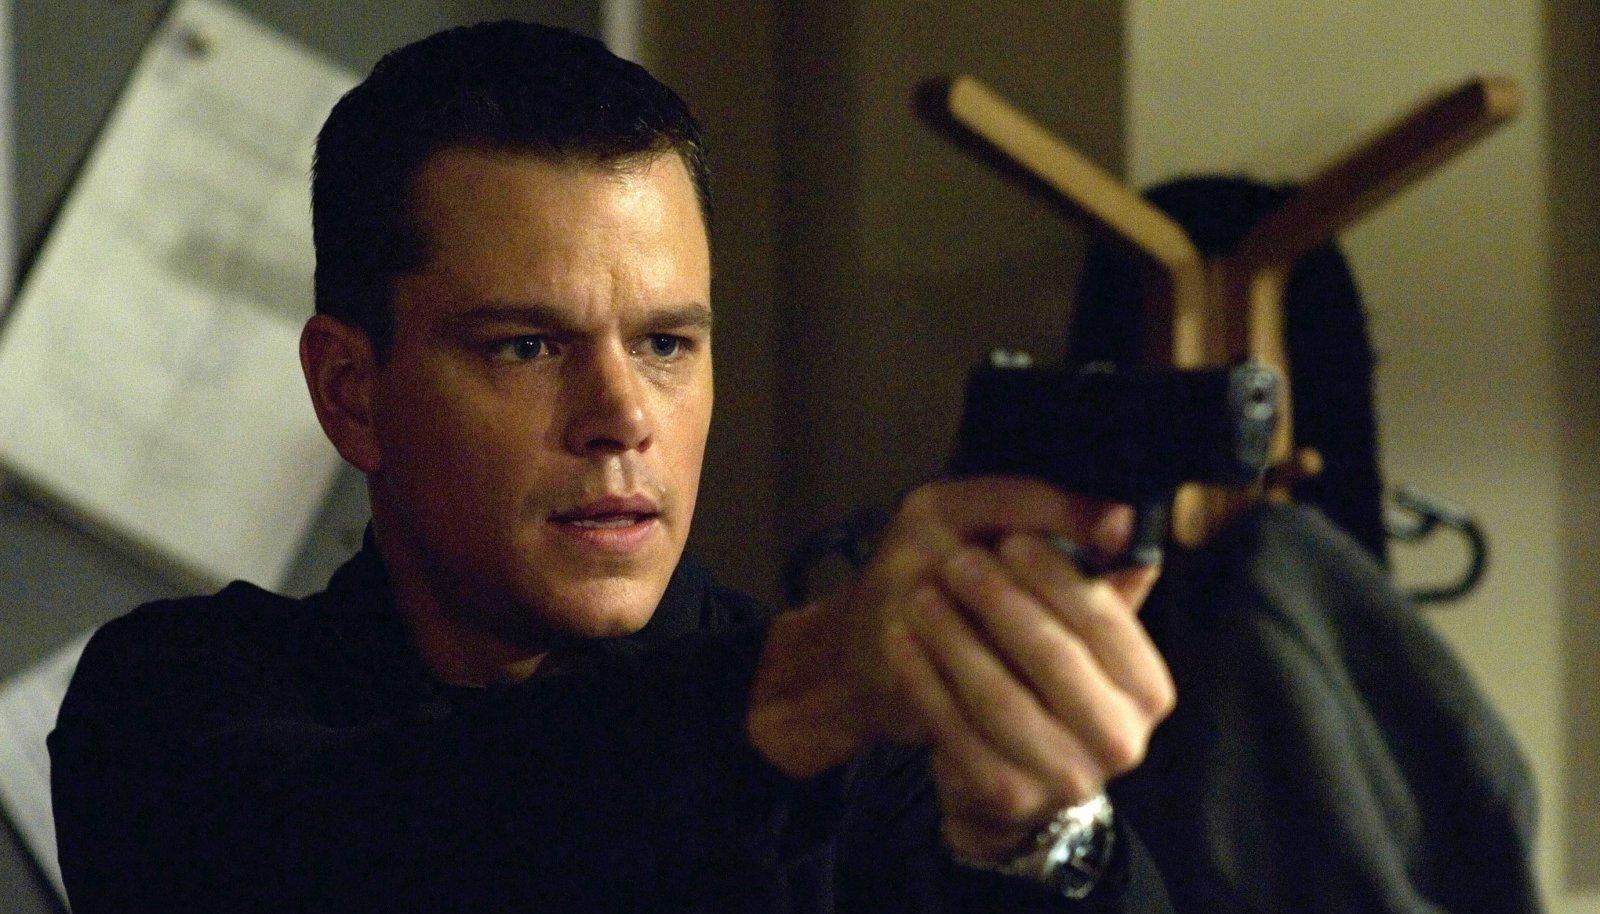 Jason Bourne Matt Damoni kehastuses